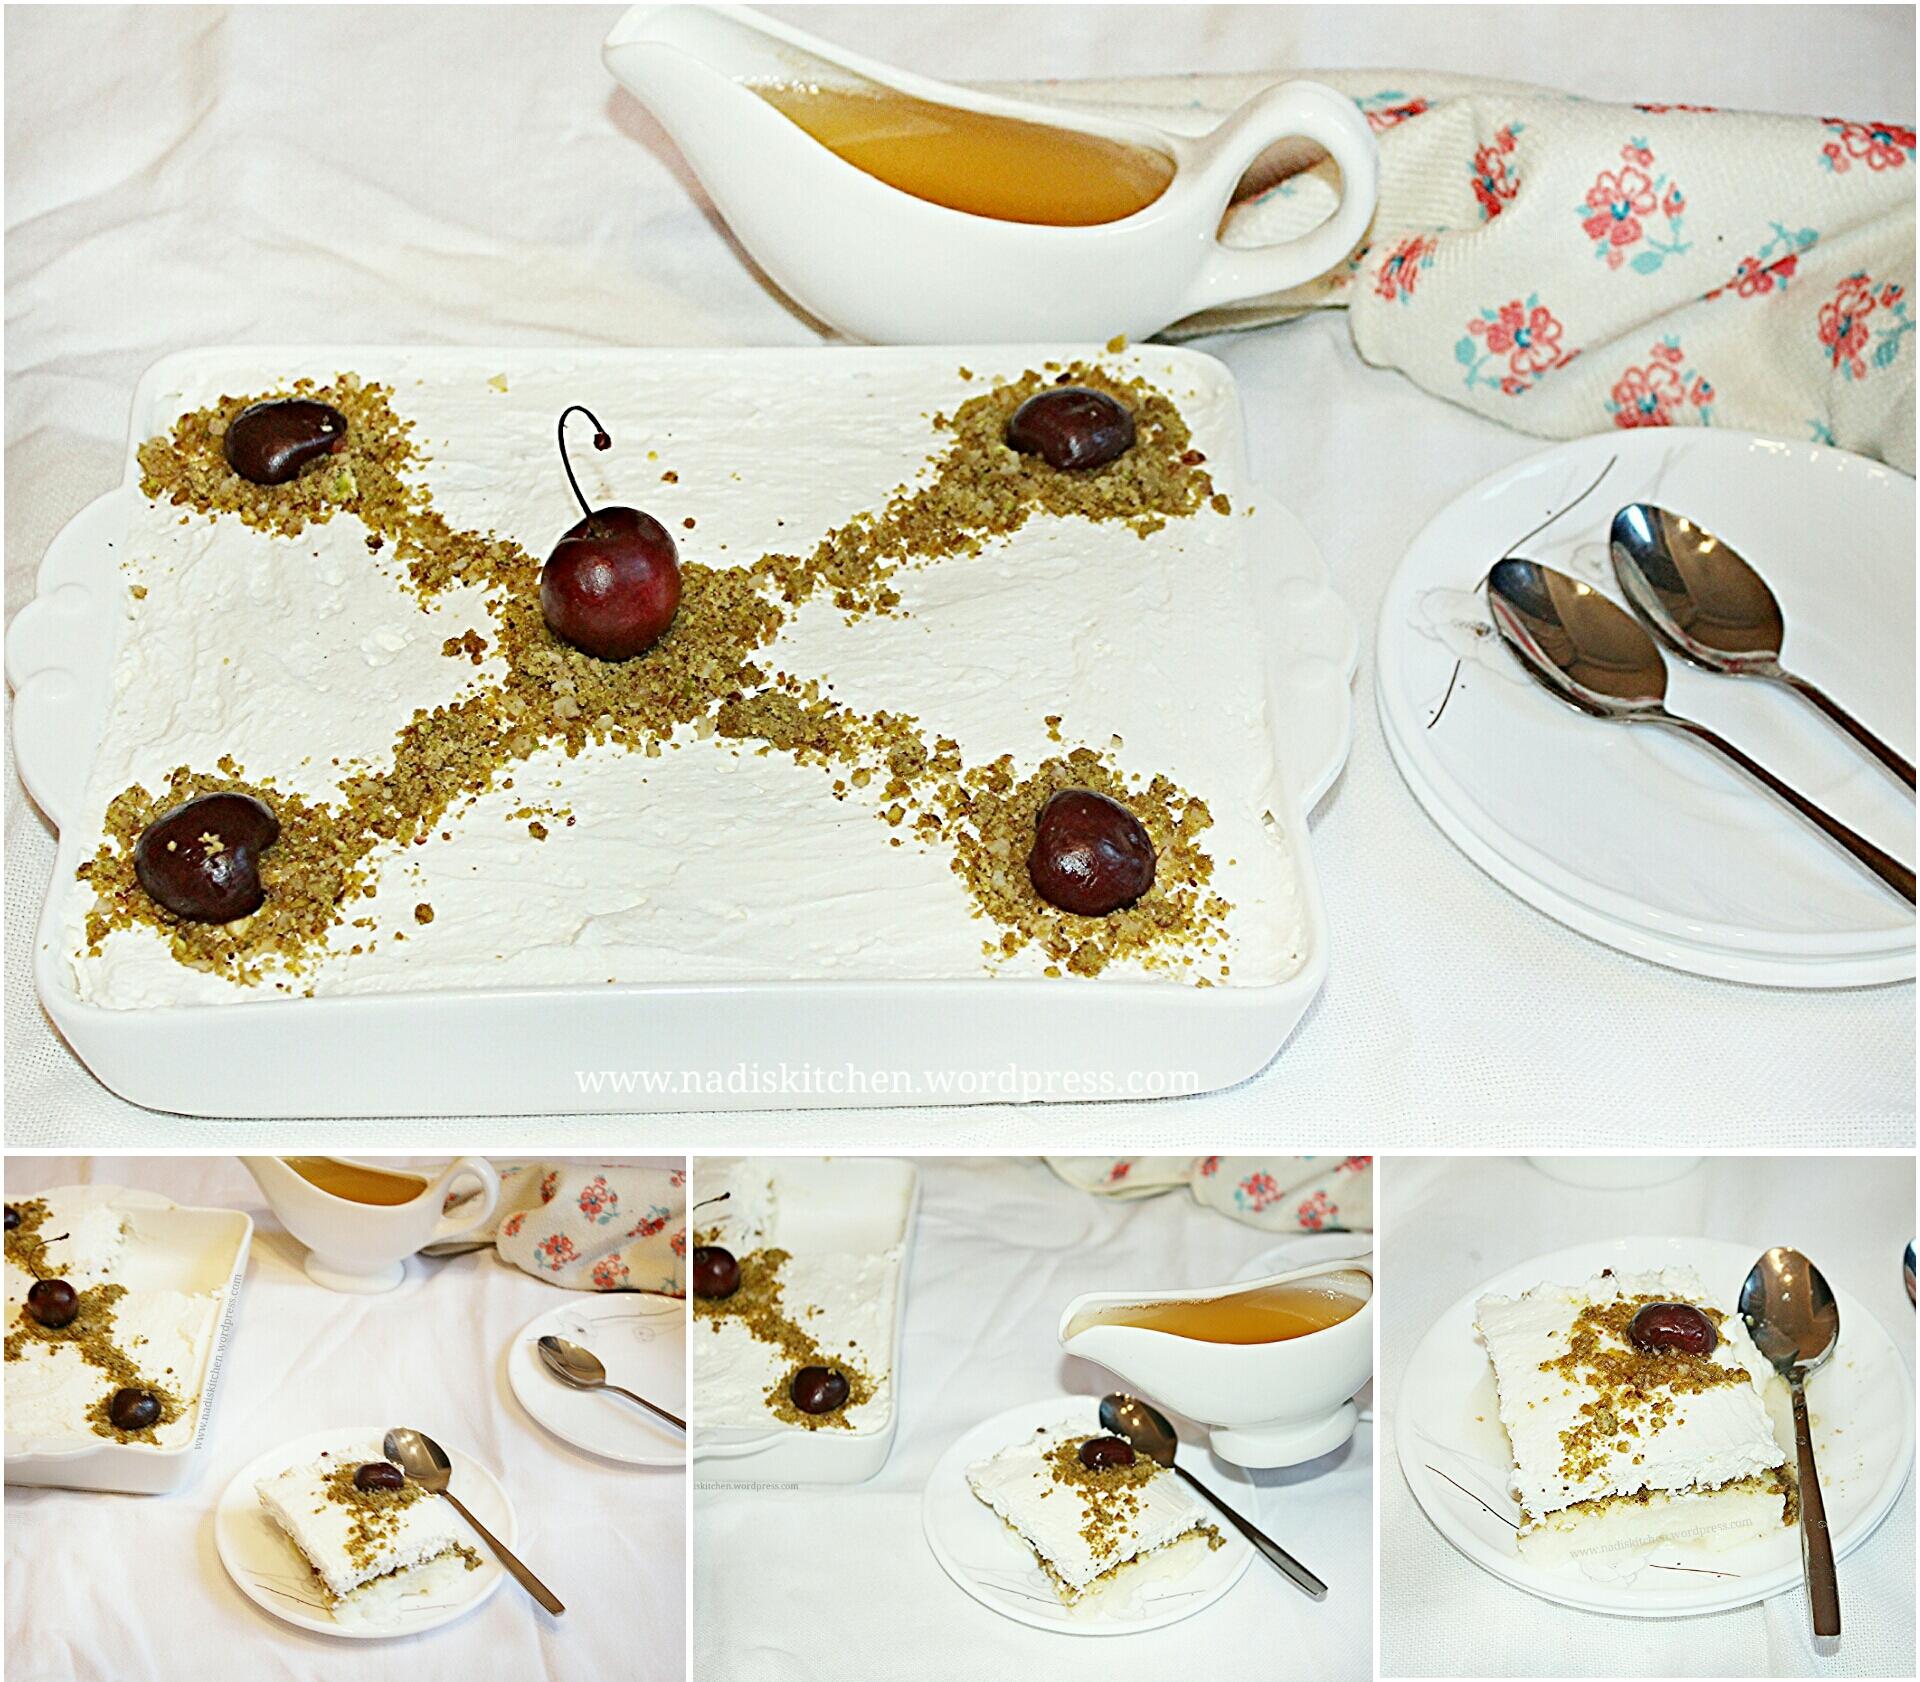 Layali Lubnan (Labanese nights) - Semolina pudding pie